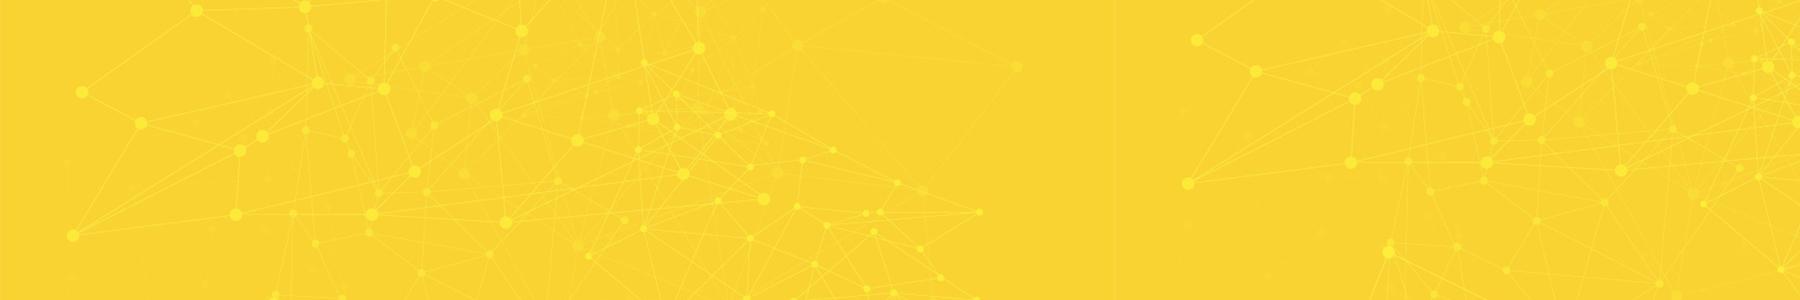 Tεχνολογίες Πληροφορίας και Επικοινωνιών - Α' Δημοτικού - 1ο Δημοτικό Ύδρας